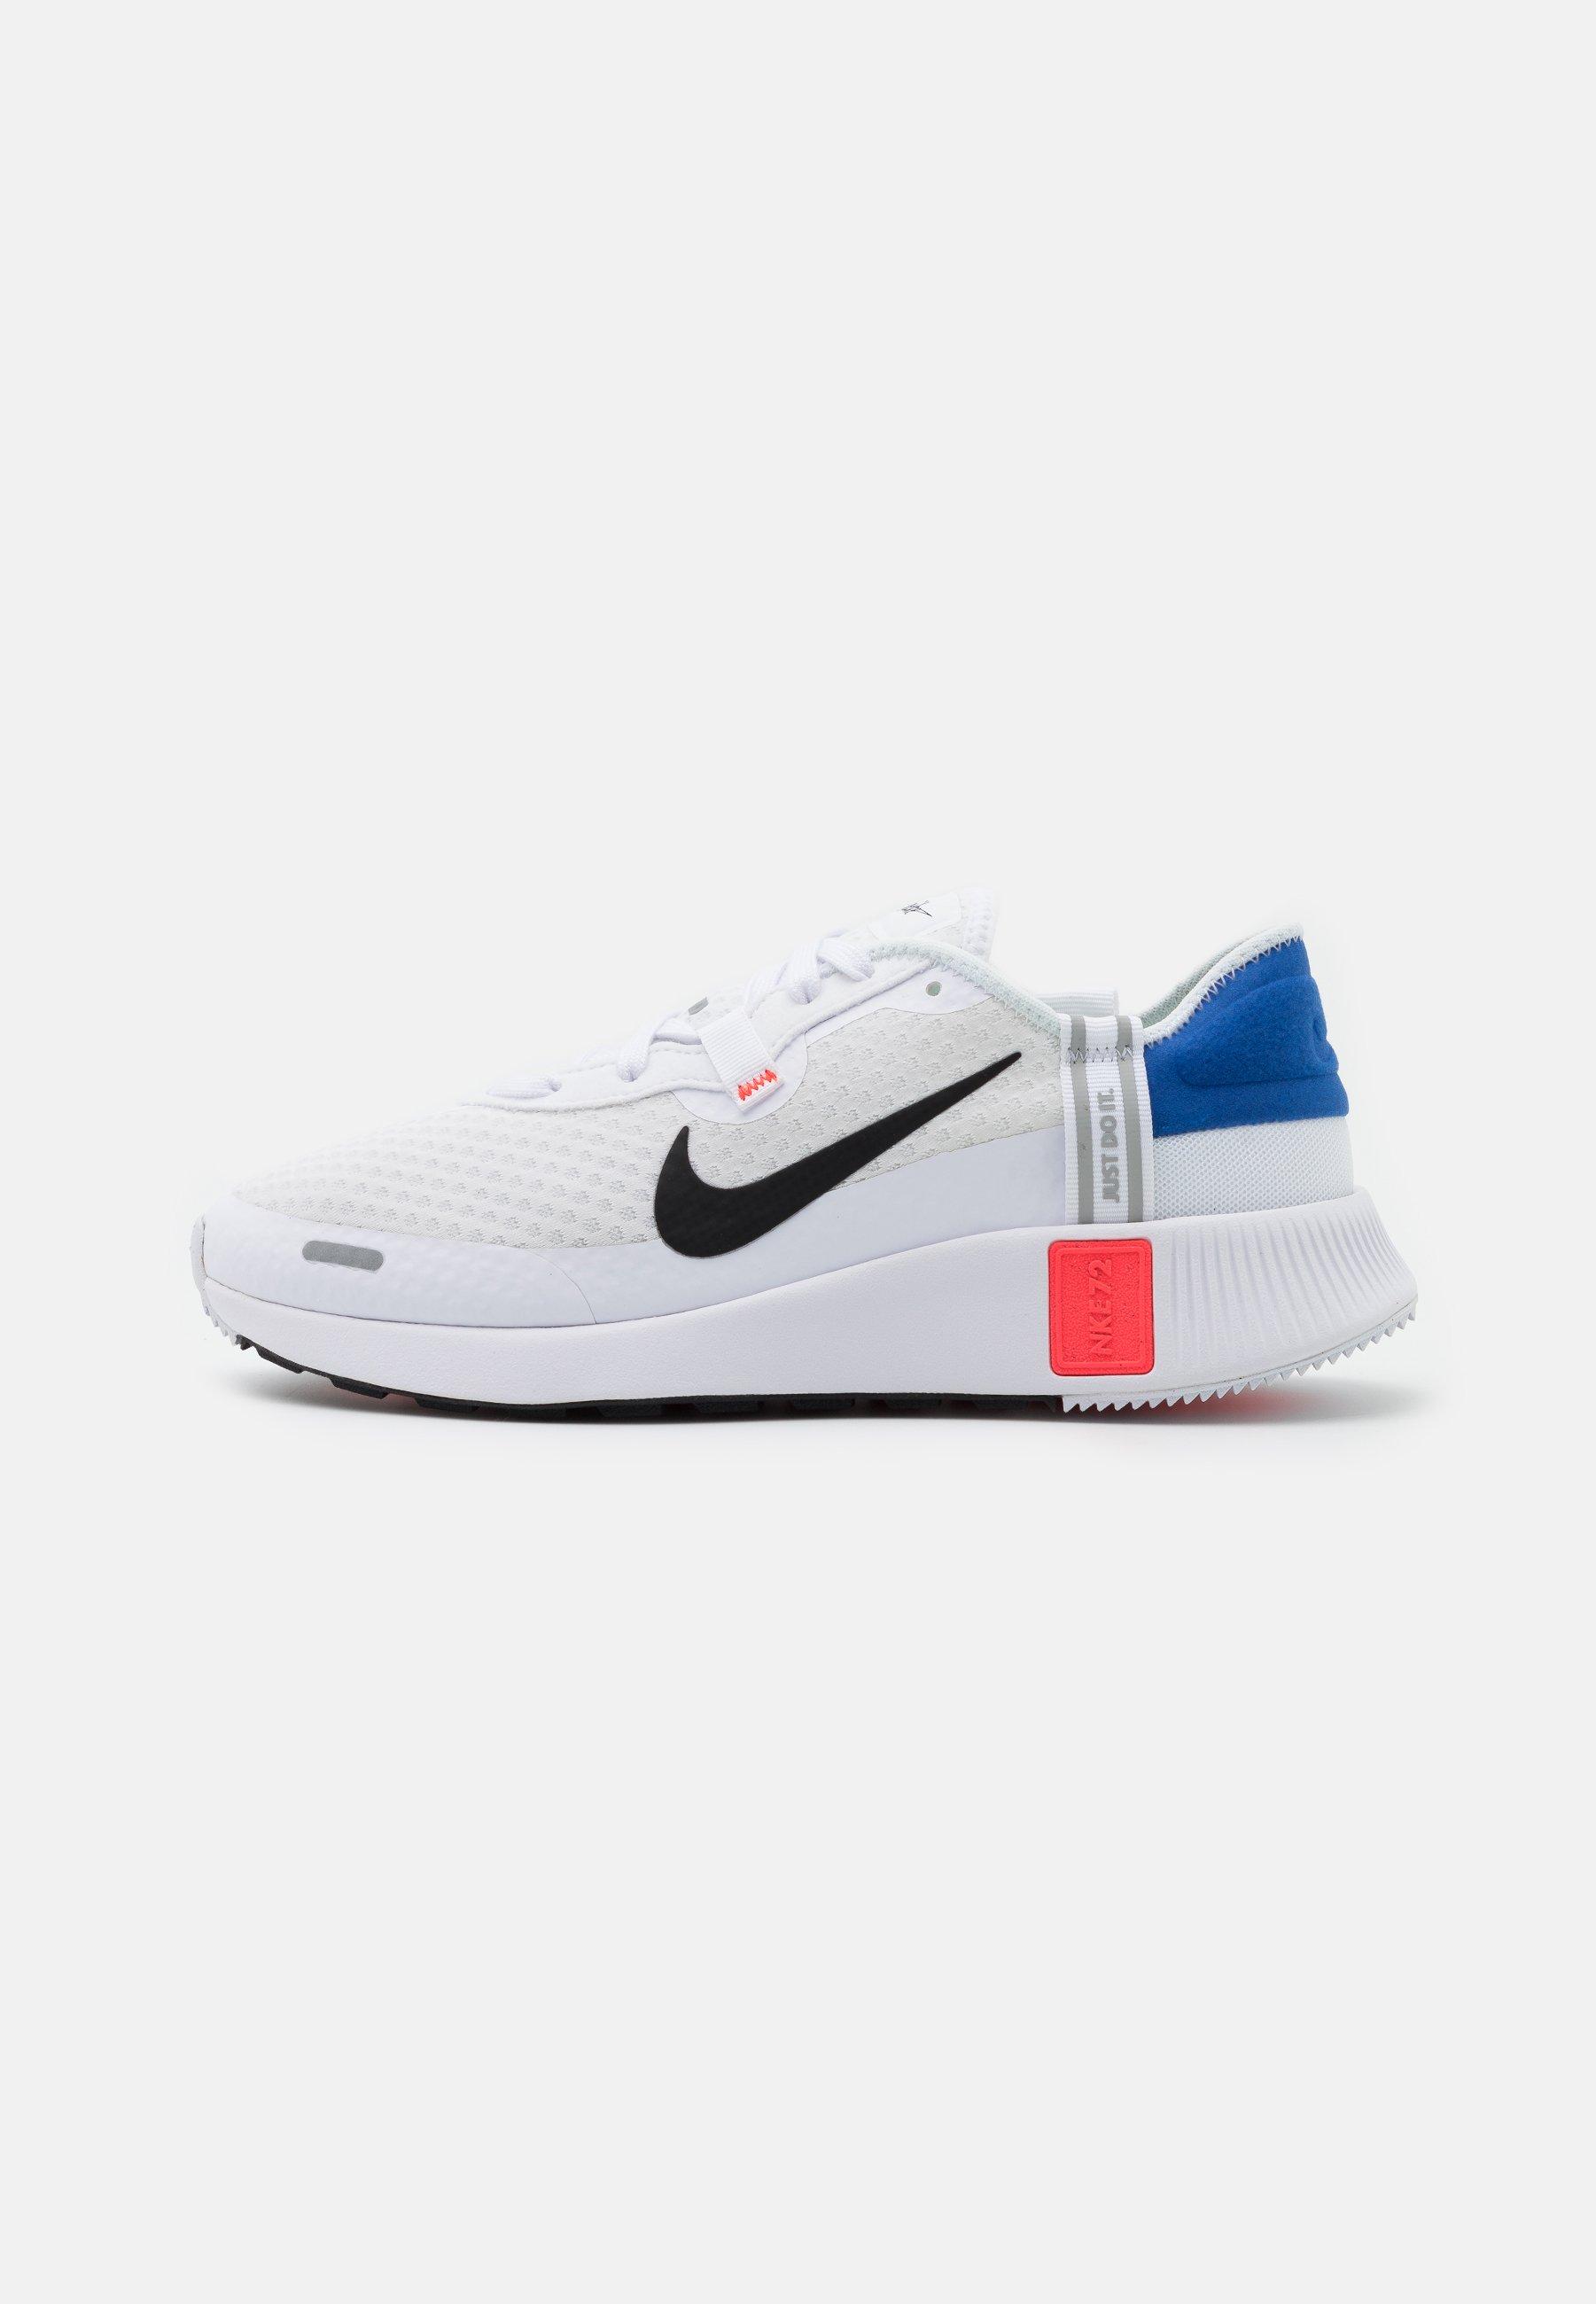 Nike Sportswear Reposto Trainers White Black Flash Crimson Game Royal Light Smoke Grey White Zalando Ie